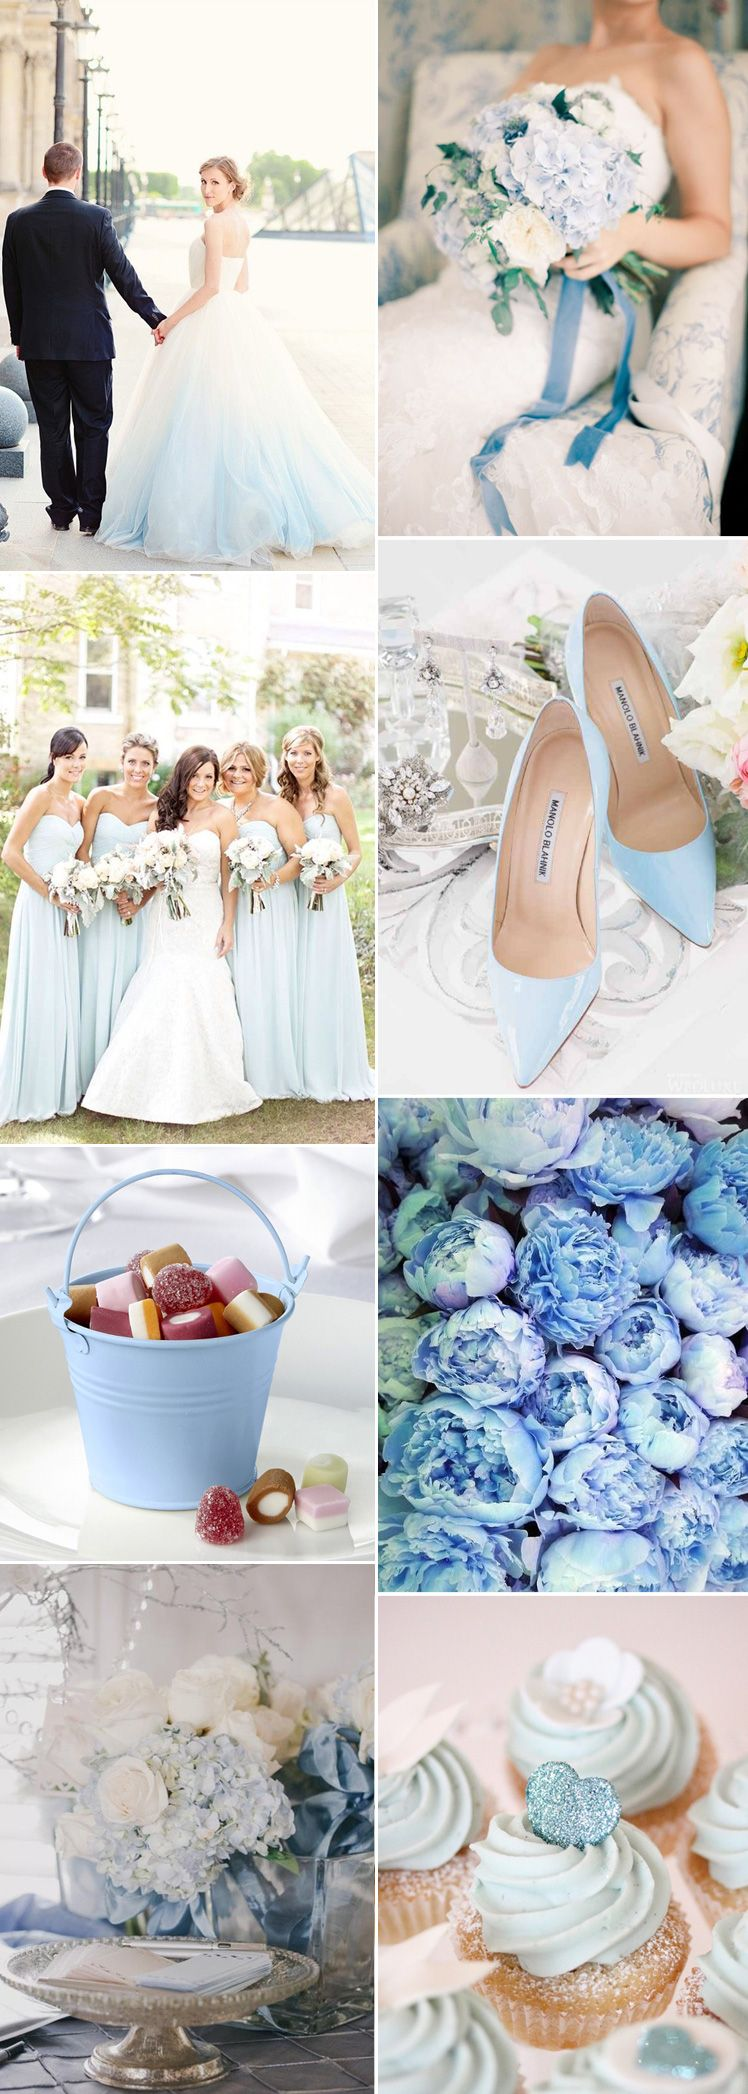 Pin by Kaitlyn Thornton on Wedding | Pinterest | Wedding, Weddings ...